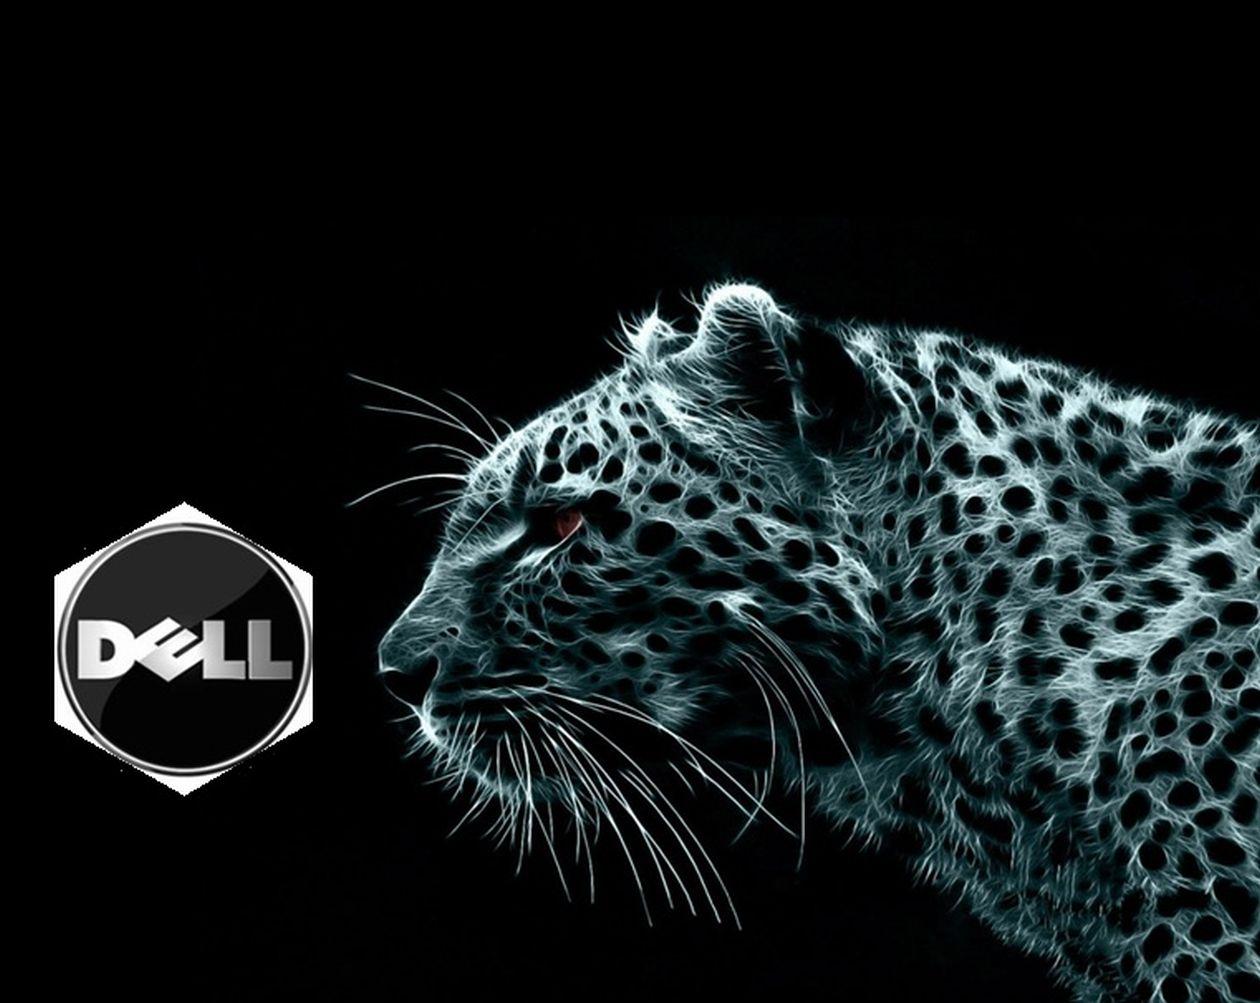 Dell Windows Xp にドライバをインストールする手順 dell愛好館